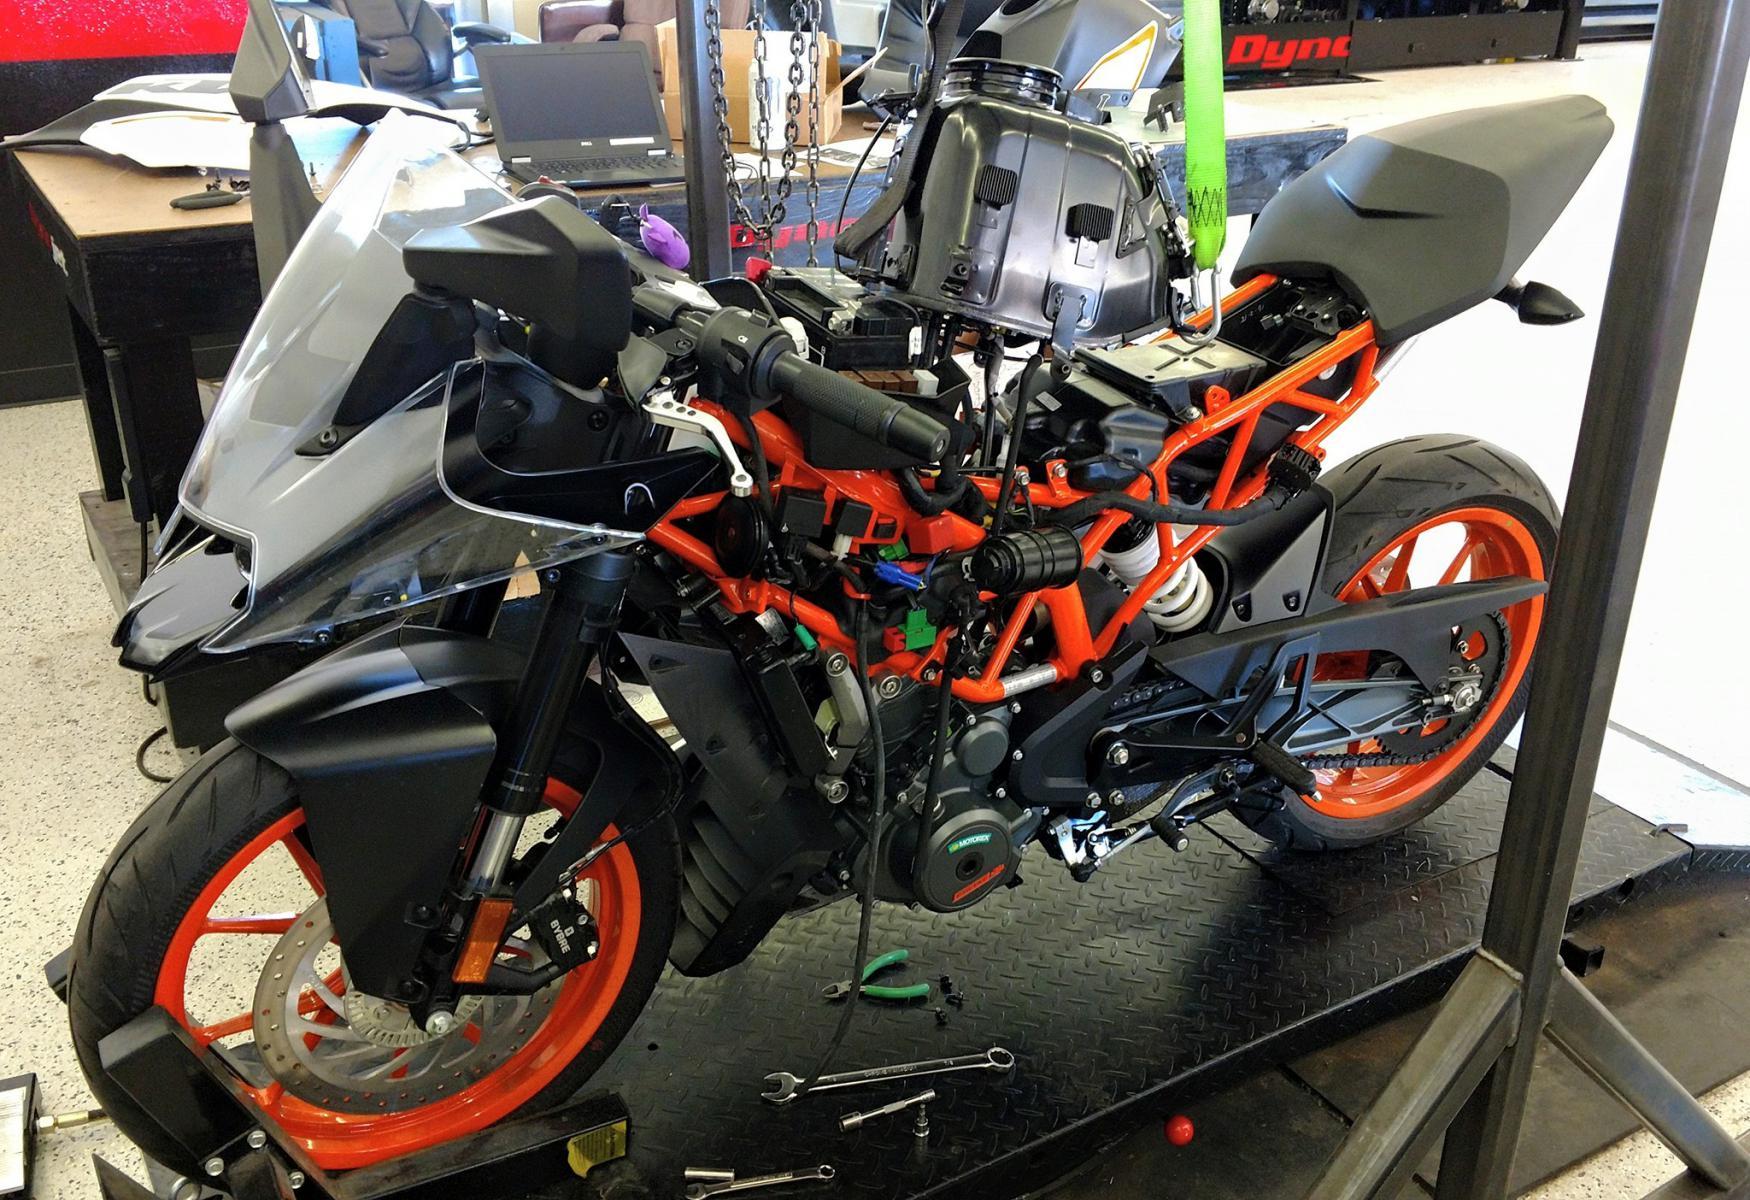 R&D Testing and ECU Reverse Engineering - KTM Duke 390 Forum